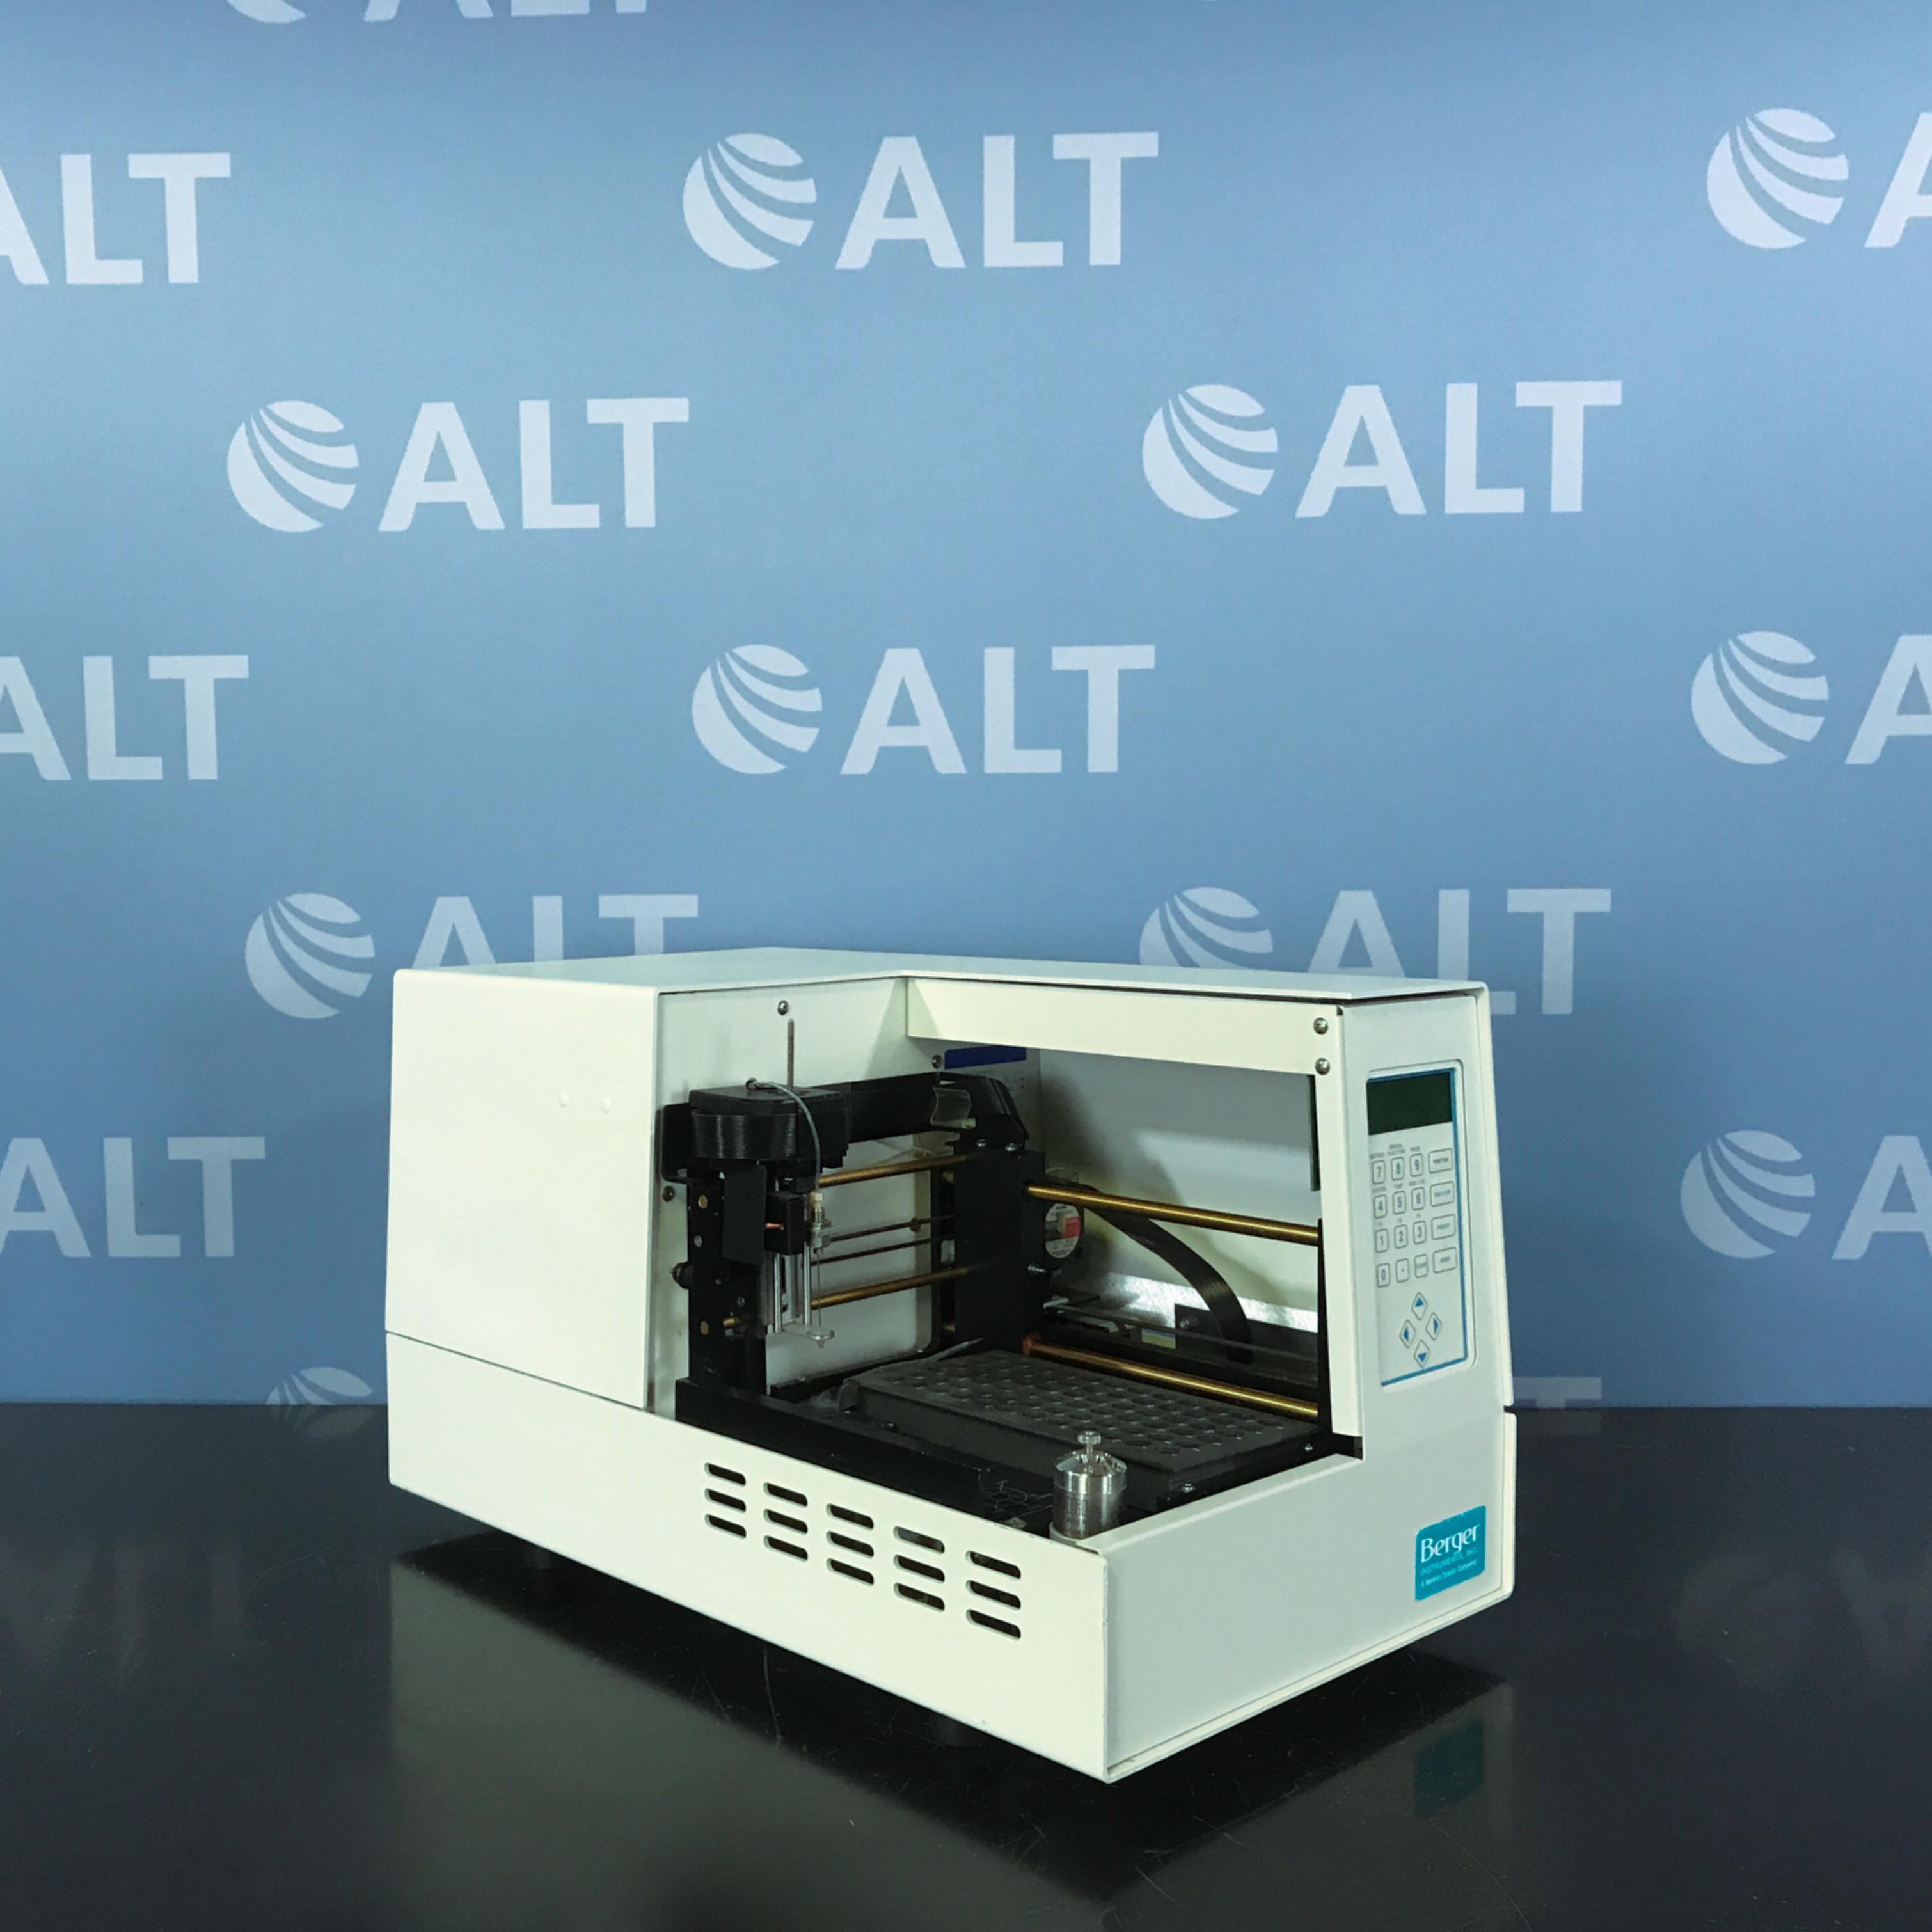 Berger SFC Analytix and MiniGram Automatic Liquid Sampler Model 719/0000032 Image